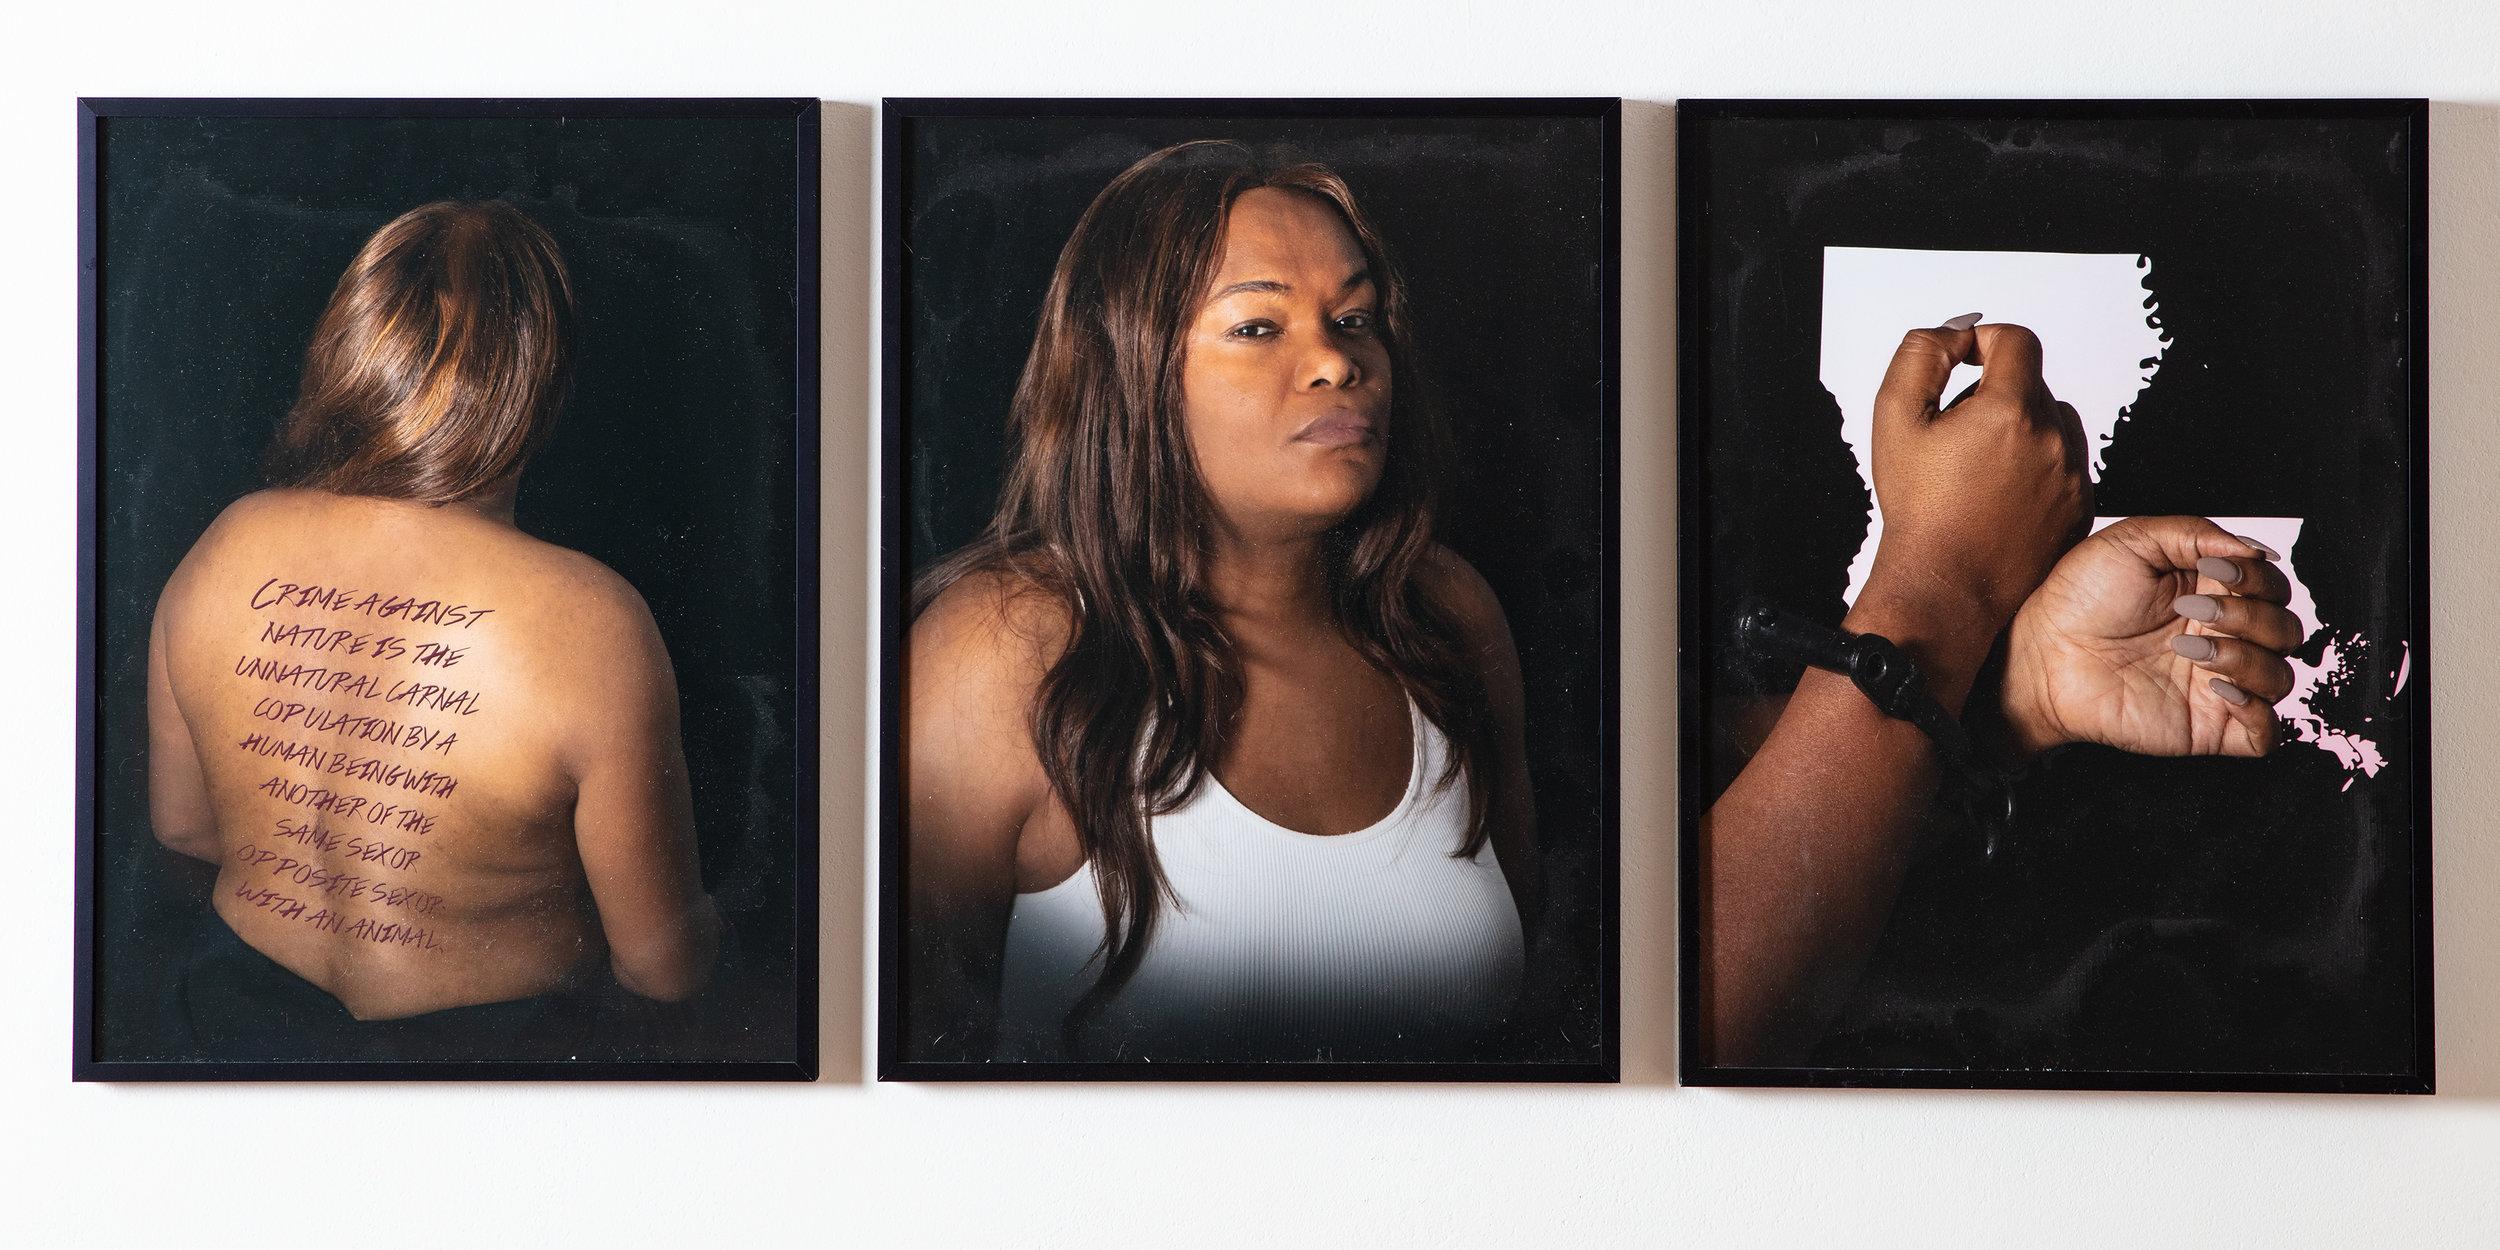 Wendi Cooper Per Sister Incarcerated Women Of Louisiana